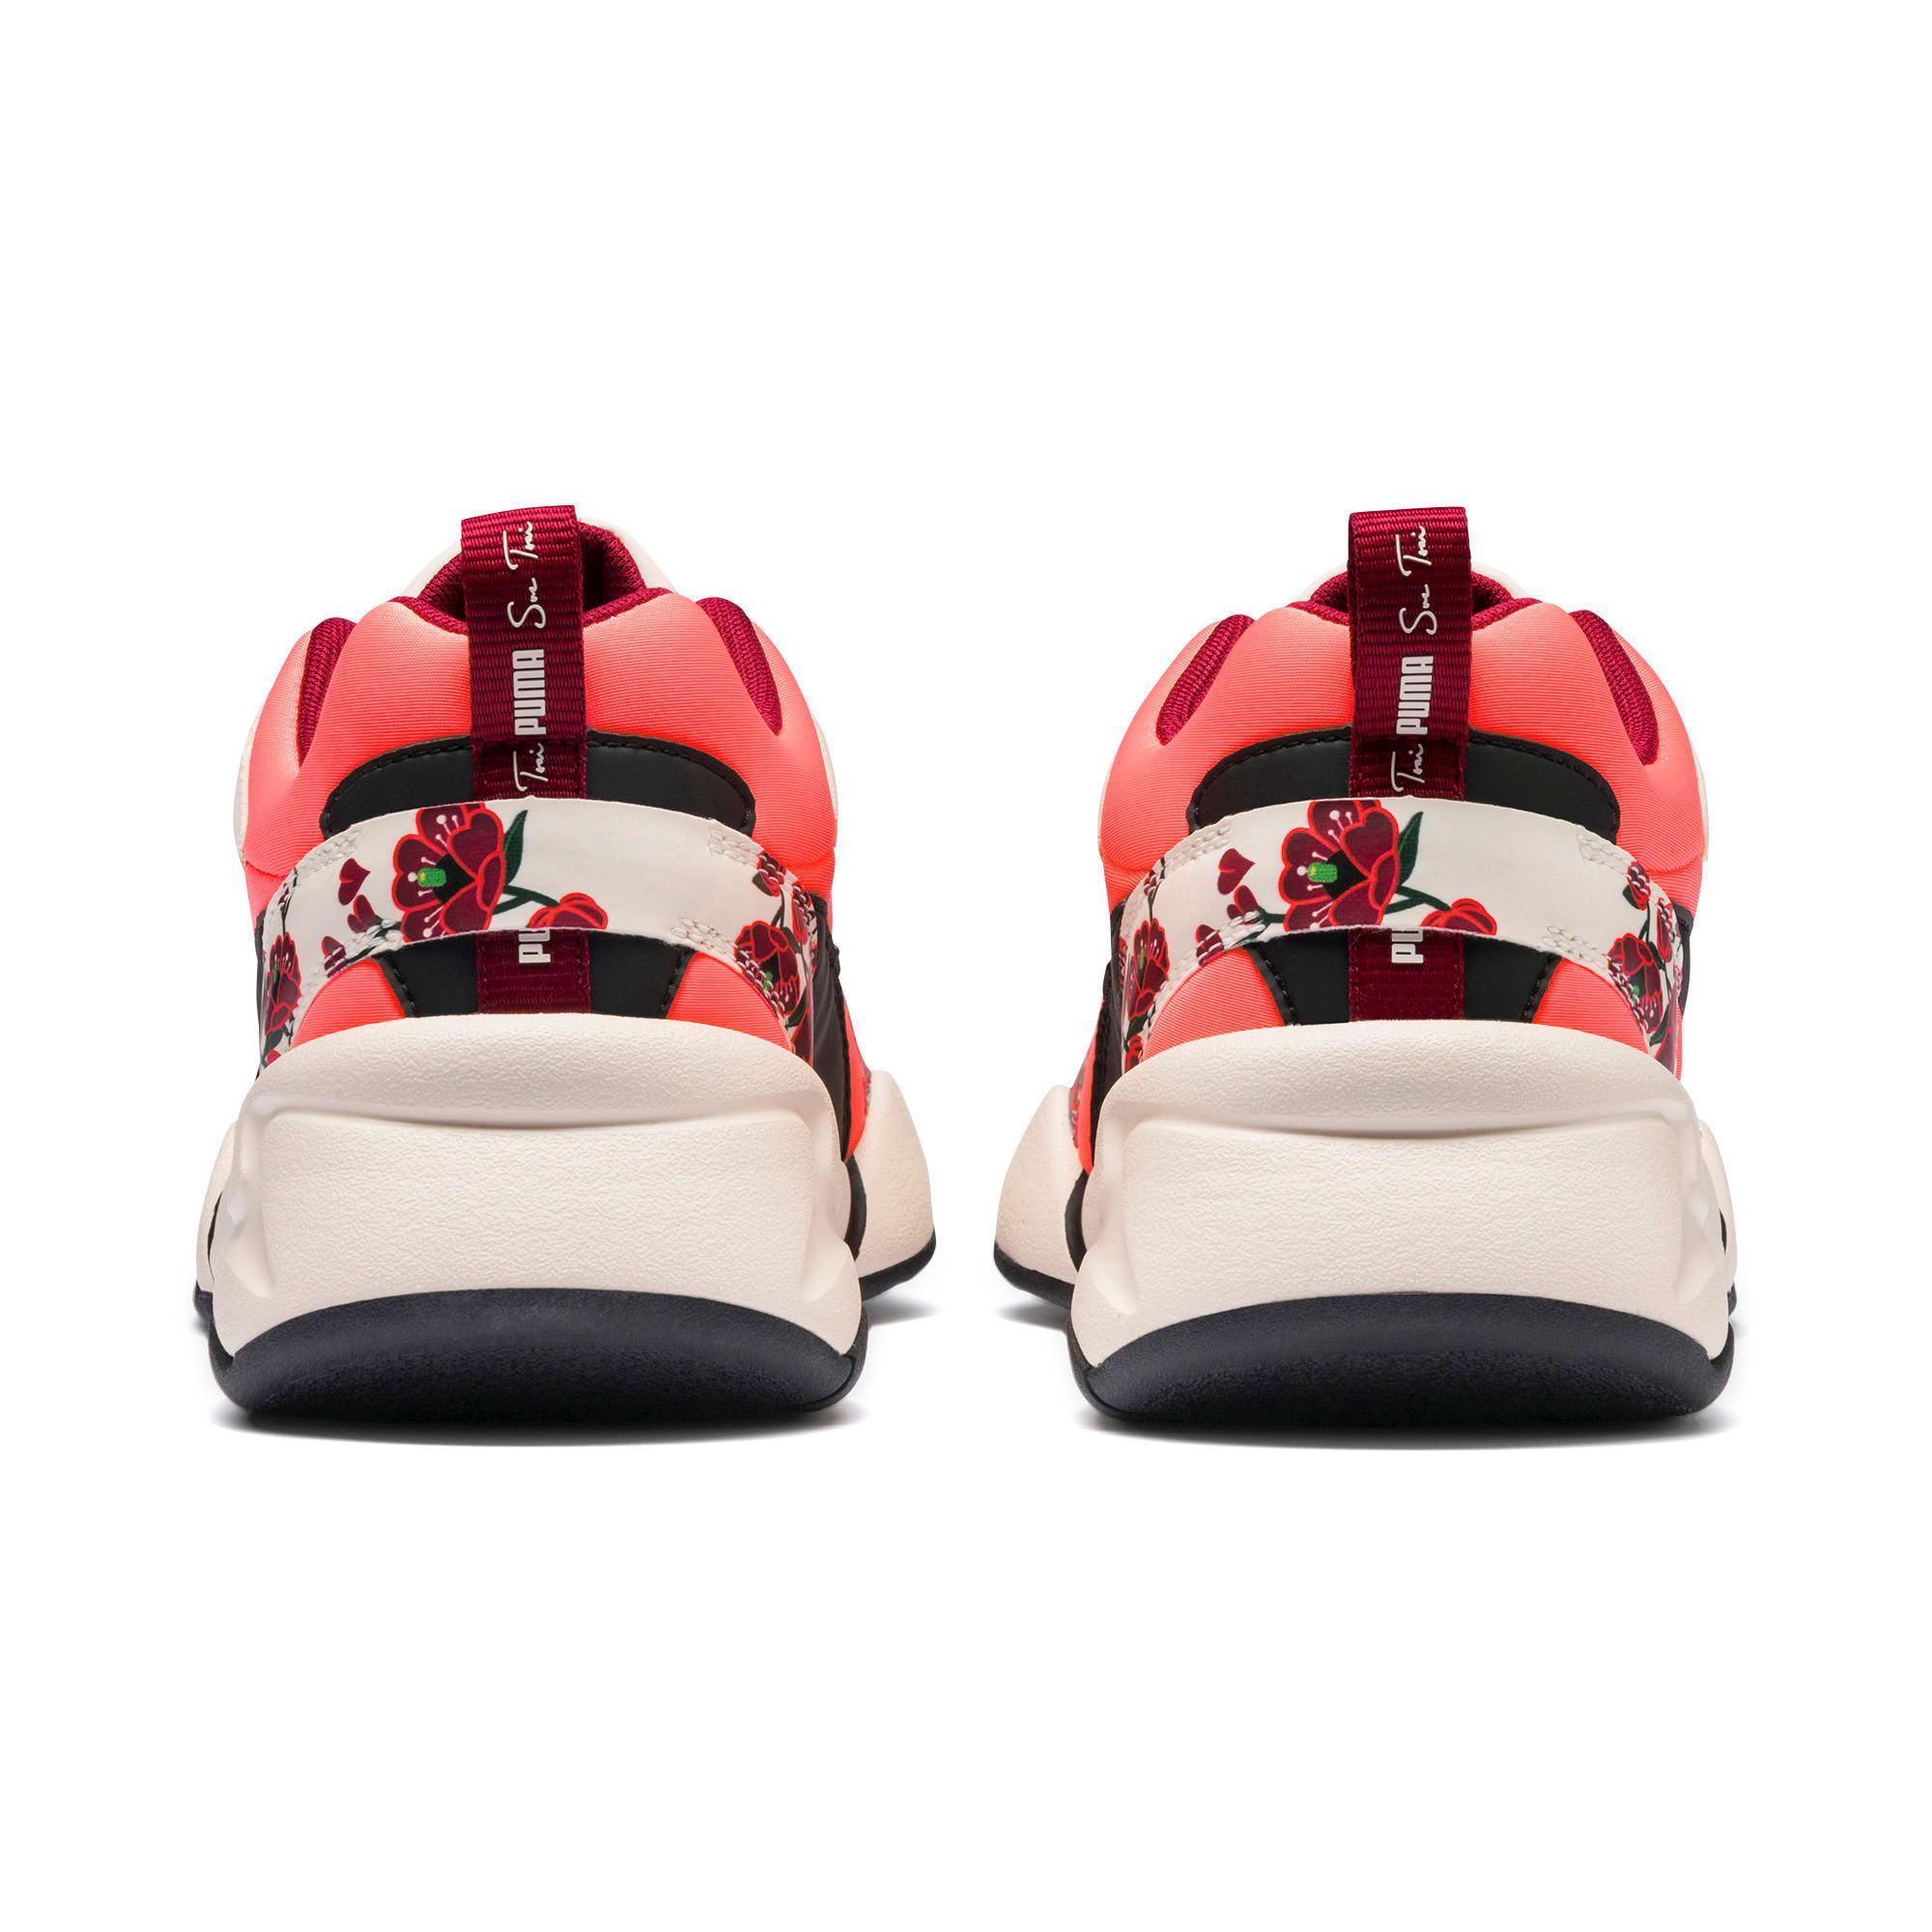 Thumbnail 4 of PUMA x SUE TSAI Nova Cherry Bombs sneakers voor dames, Powder Puff-Puma Black, medium